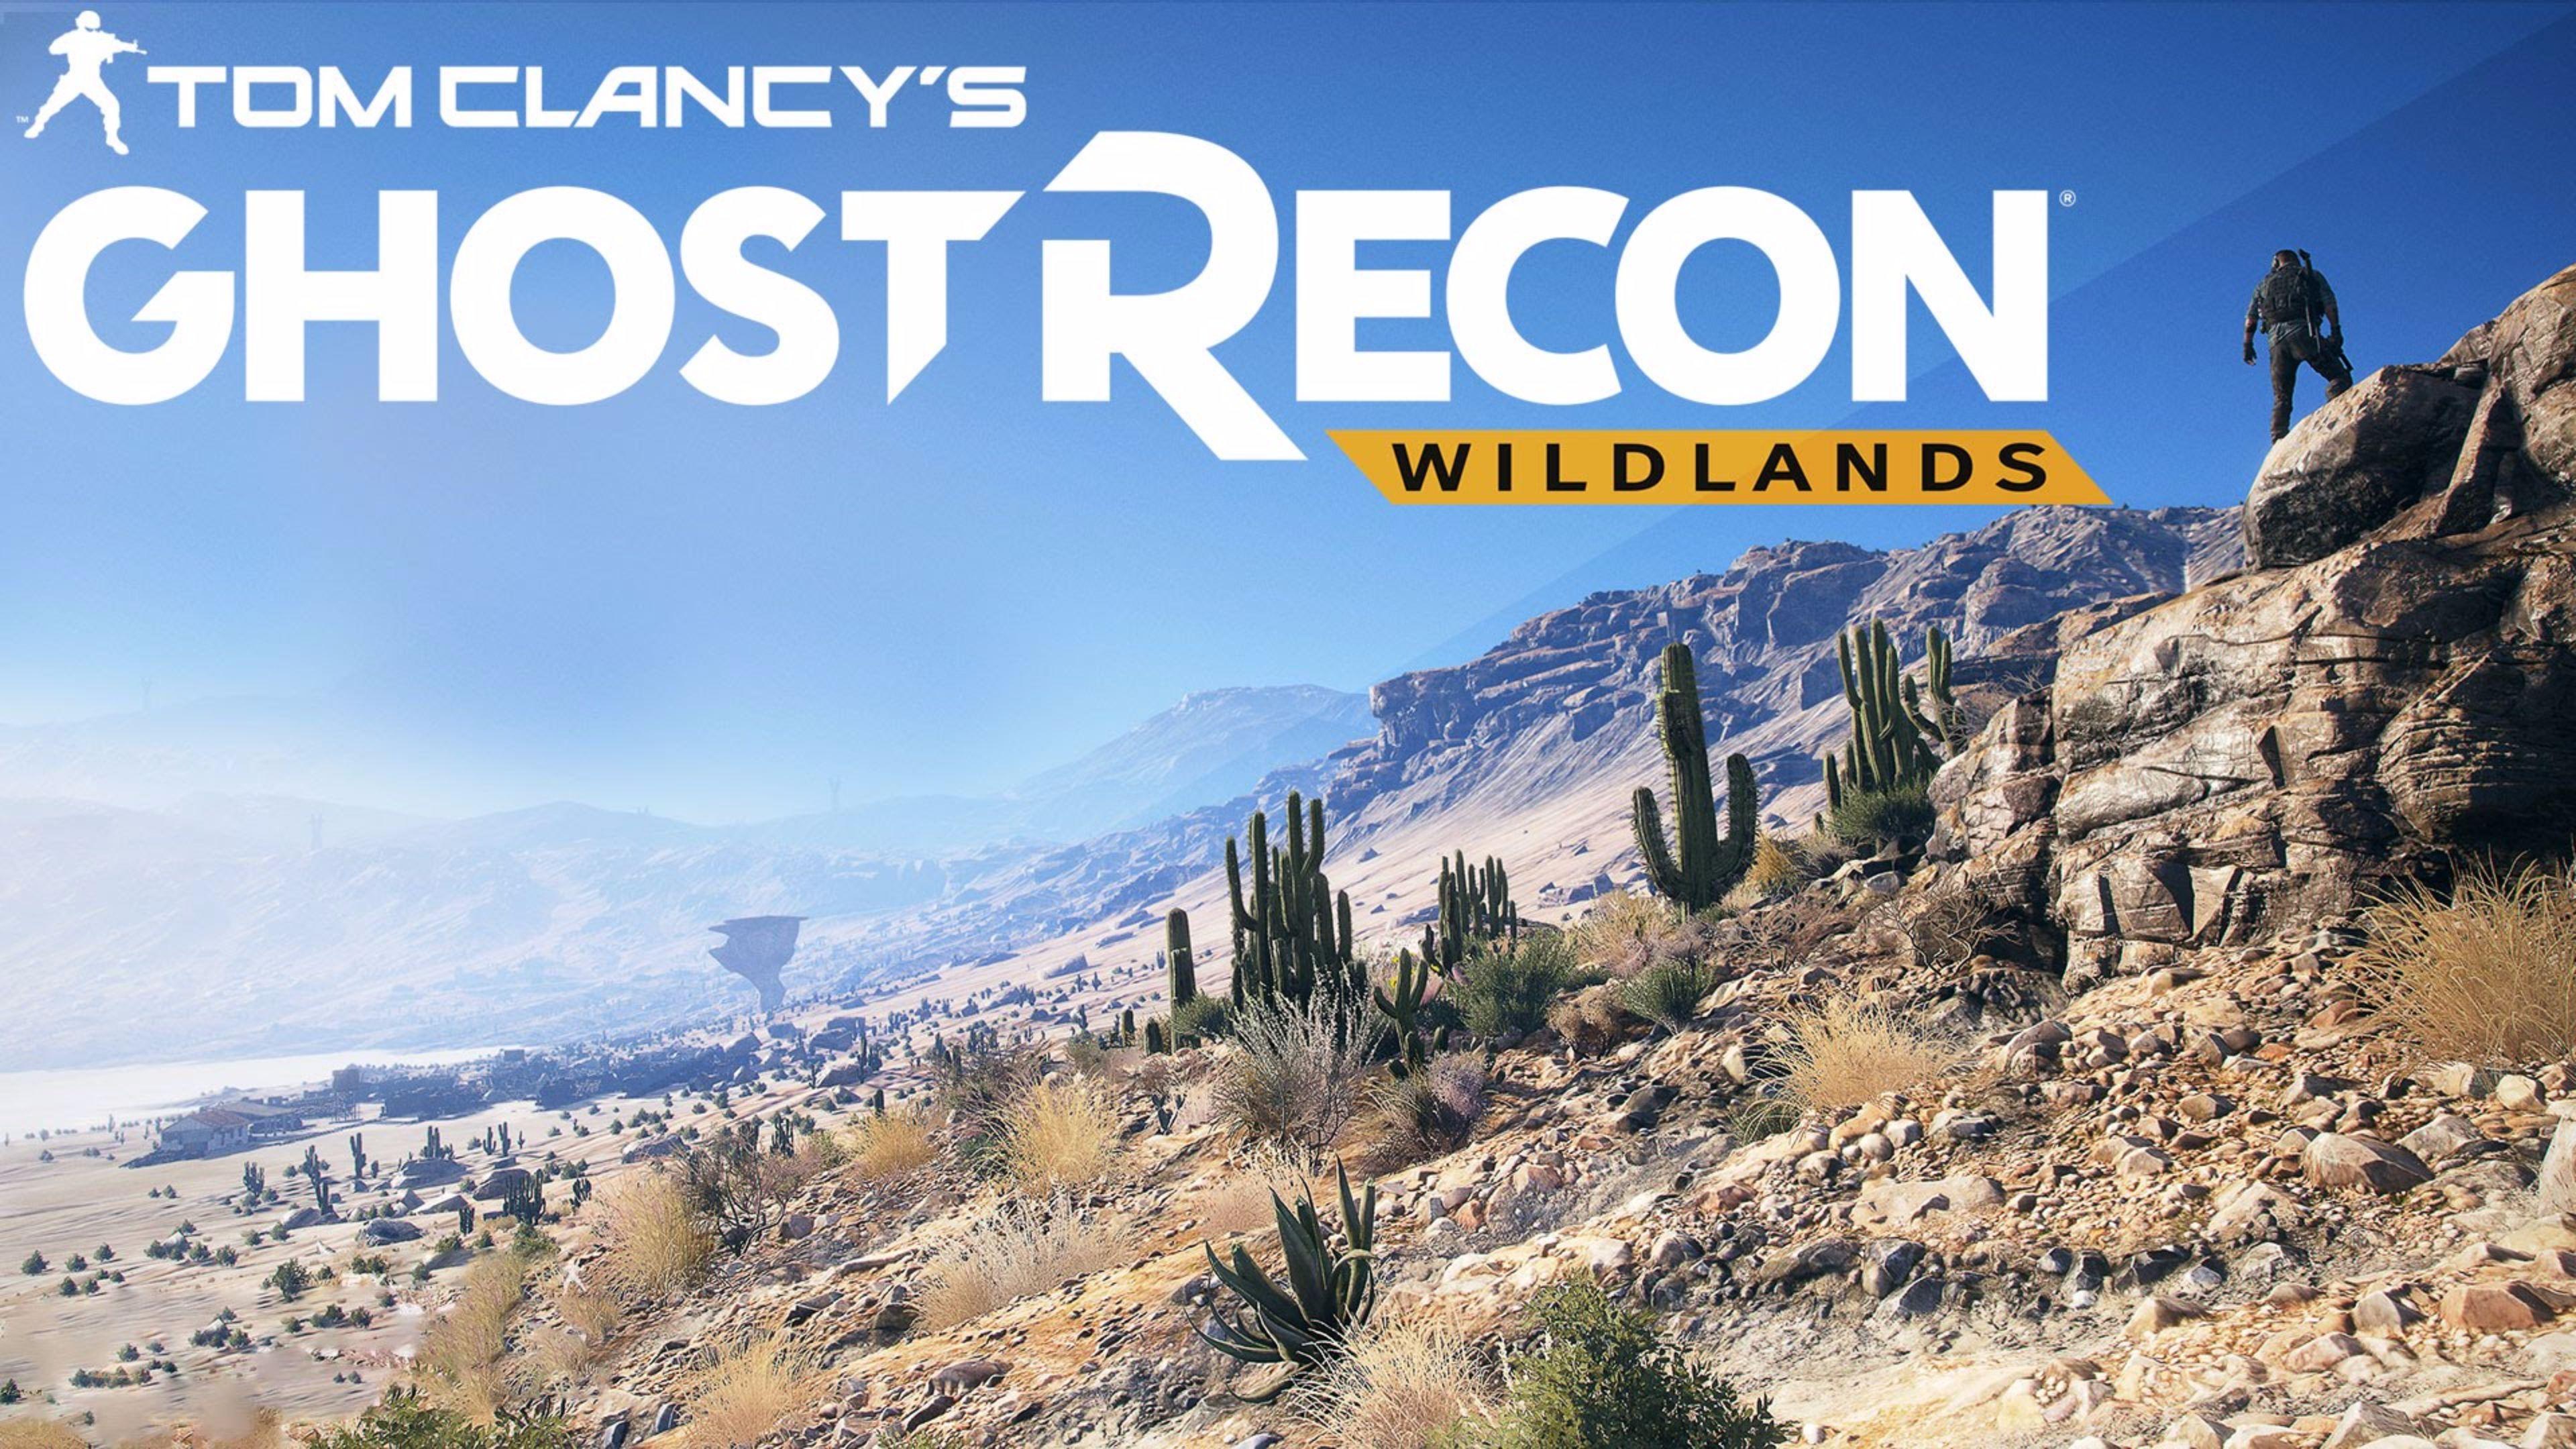 Tom Clancys Ghost Recon Wildlands 4k Ultra Fond Décran Hd